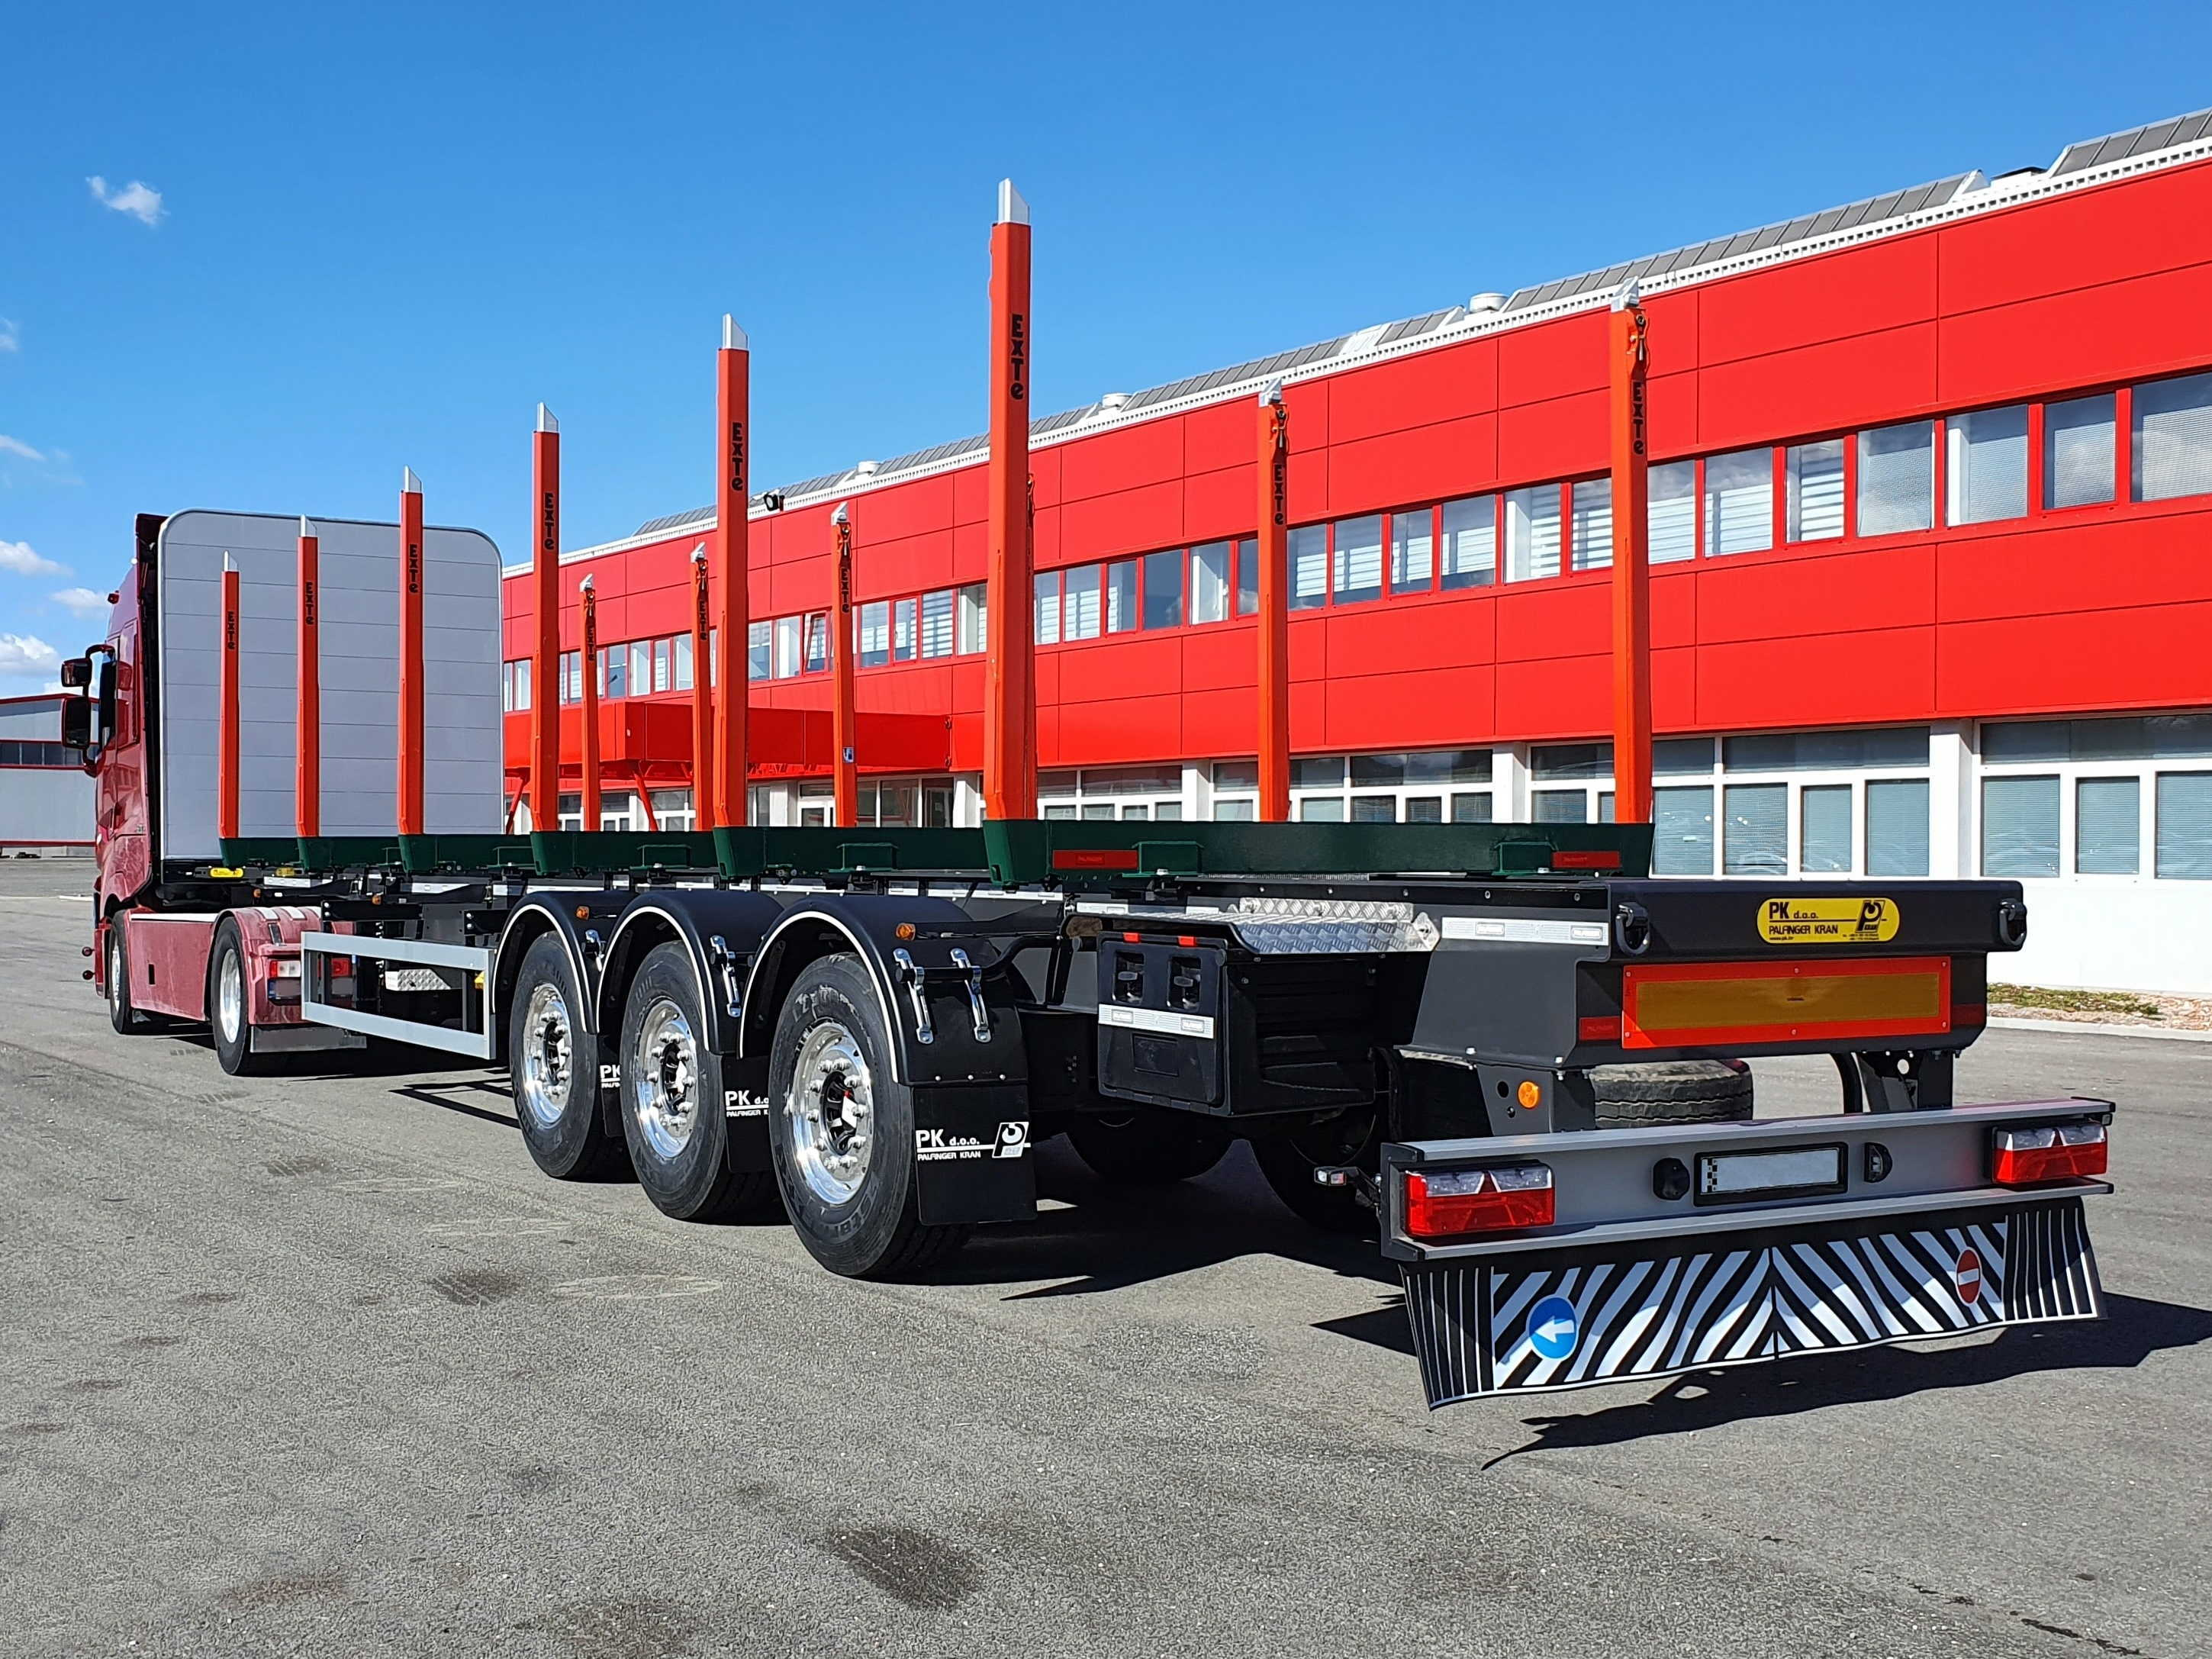 Poluprikolica_transport trupaca_Semitrailer_timber transport_8